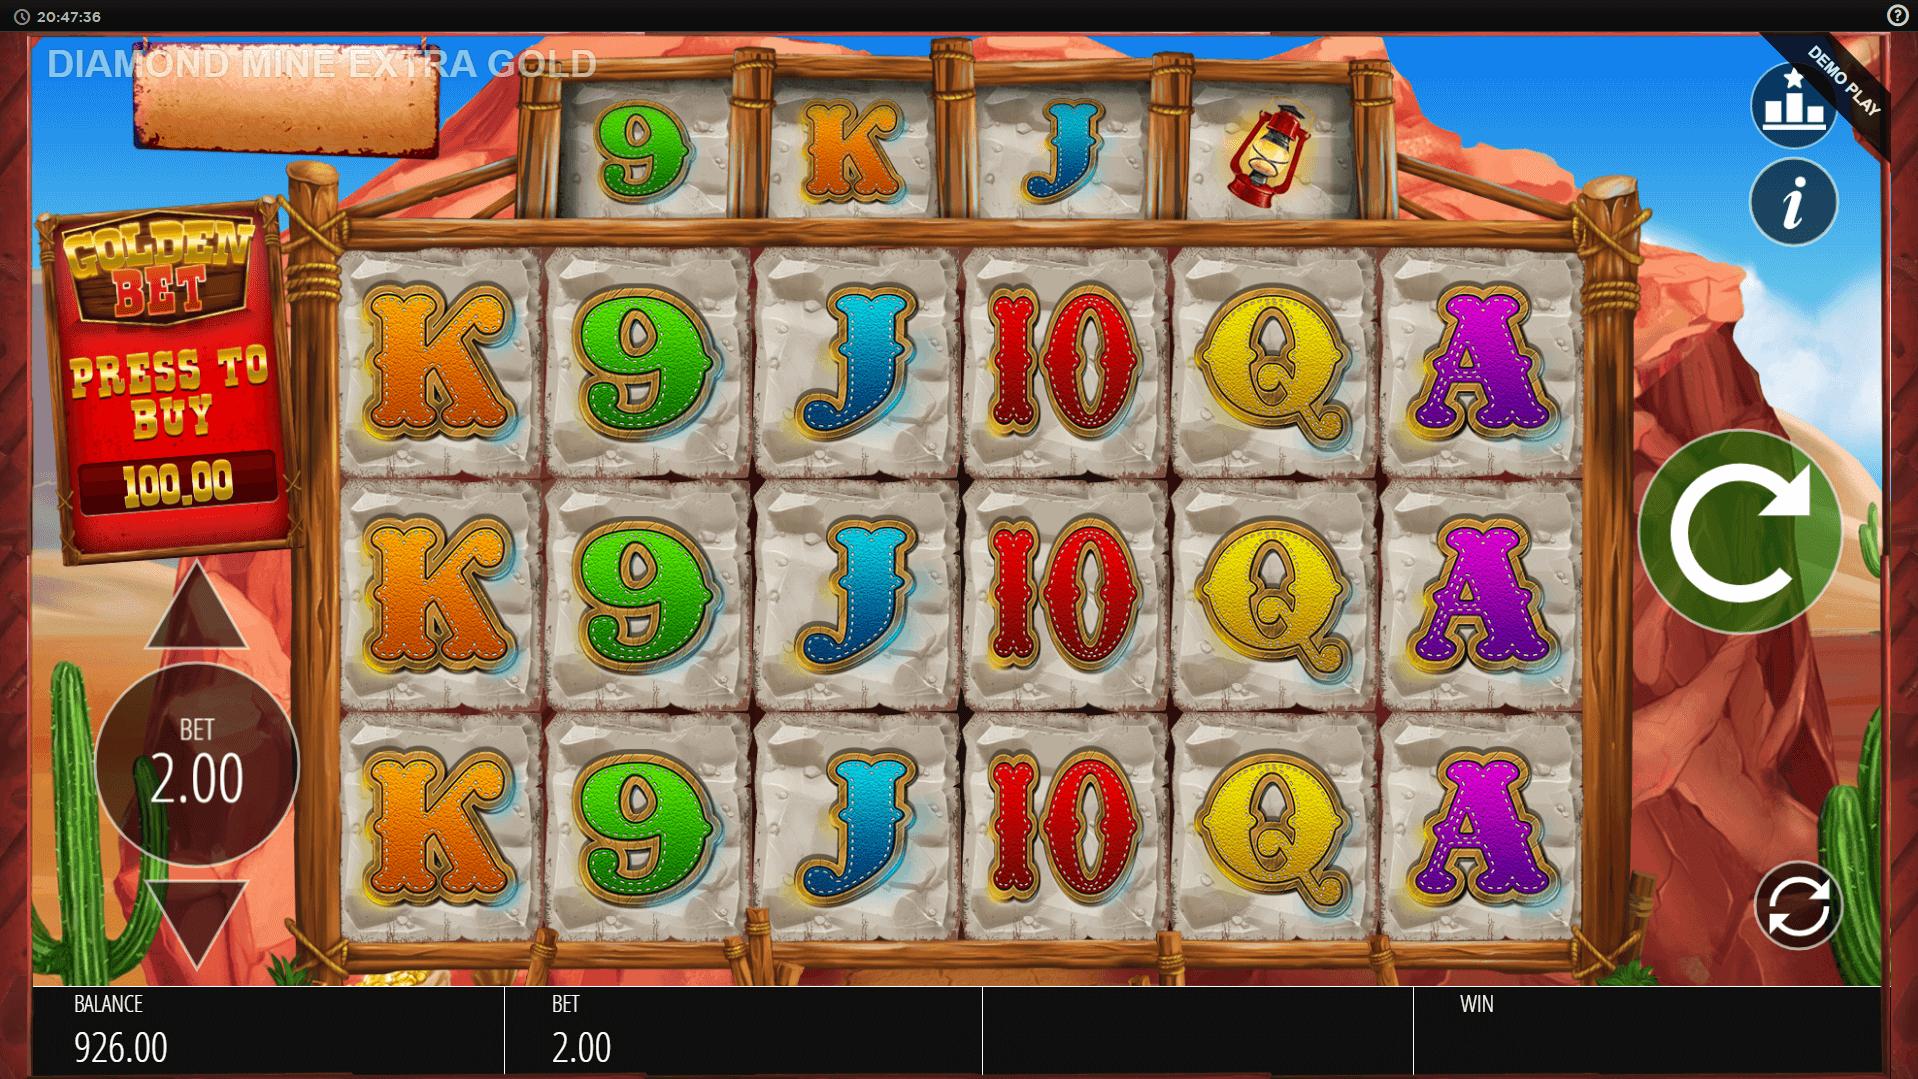 Diamond Mine Extra Gold Megaways slot machine screenshot